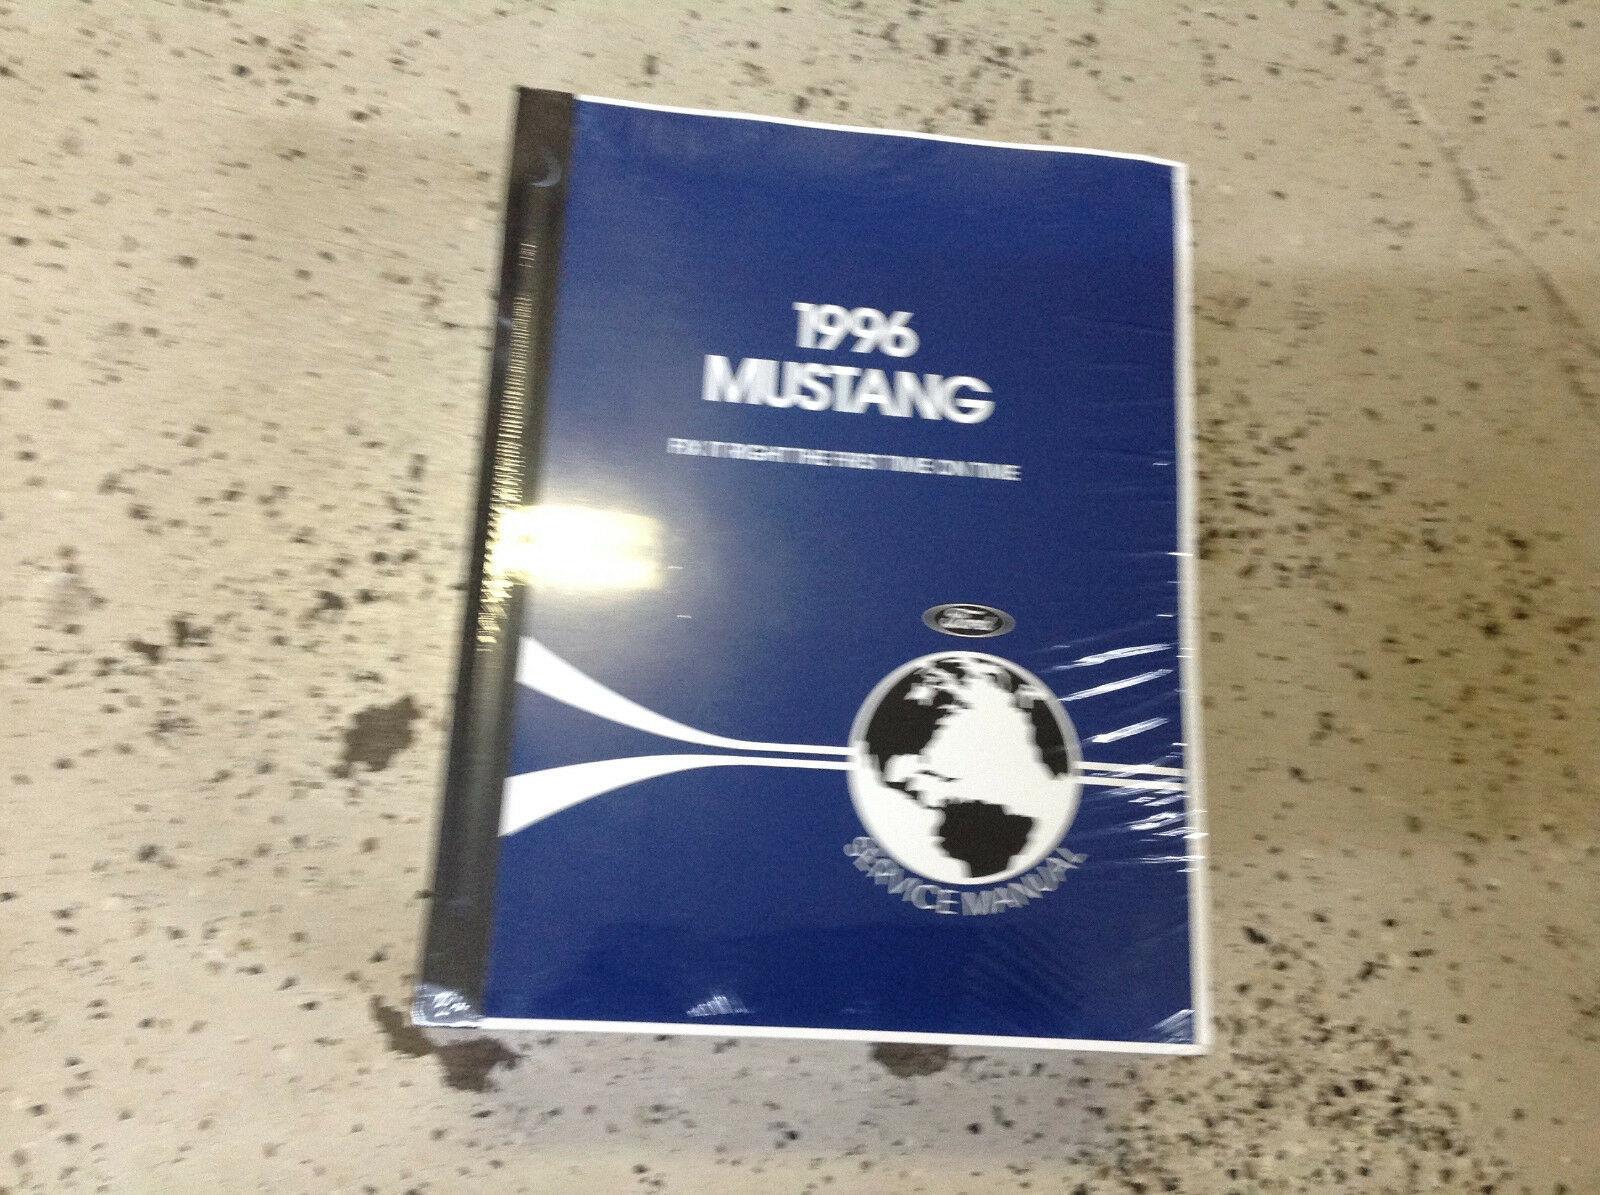 1996 Ford Mustang Gt Cobra Mach Service Shop Reparatur Werkstatt Manuell Neu image 2